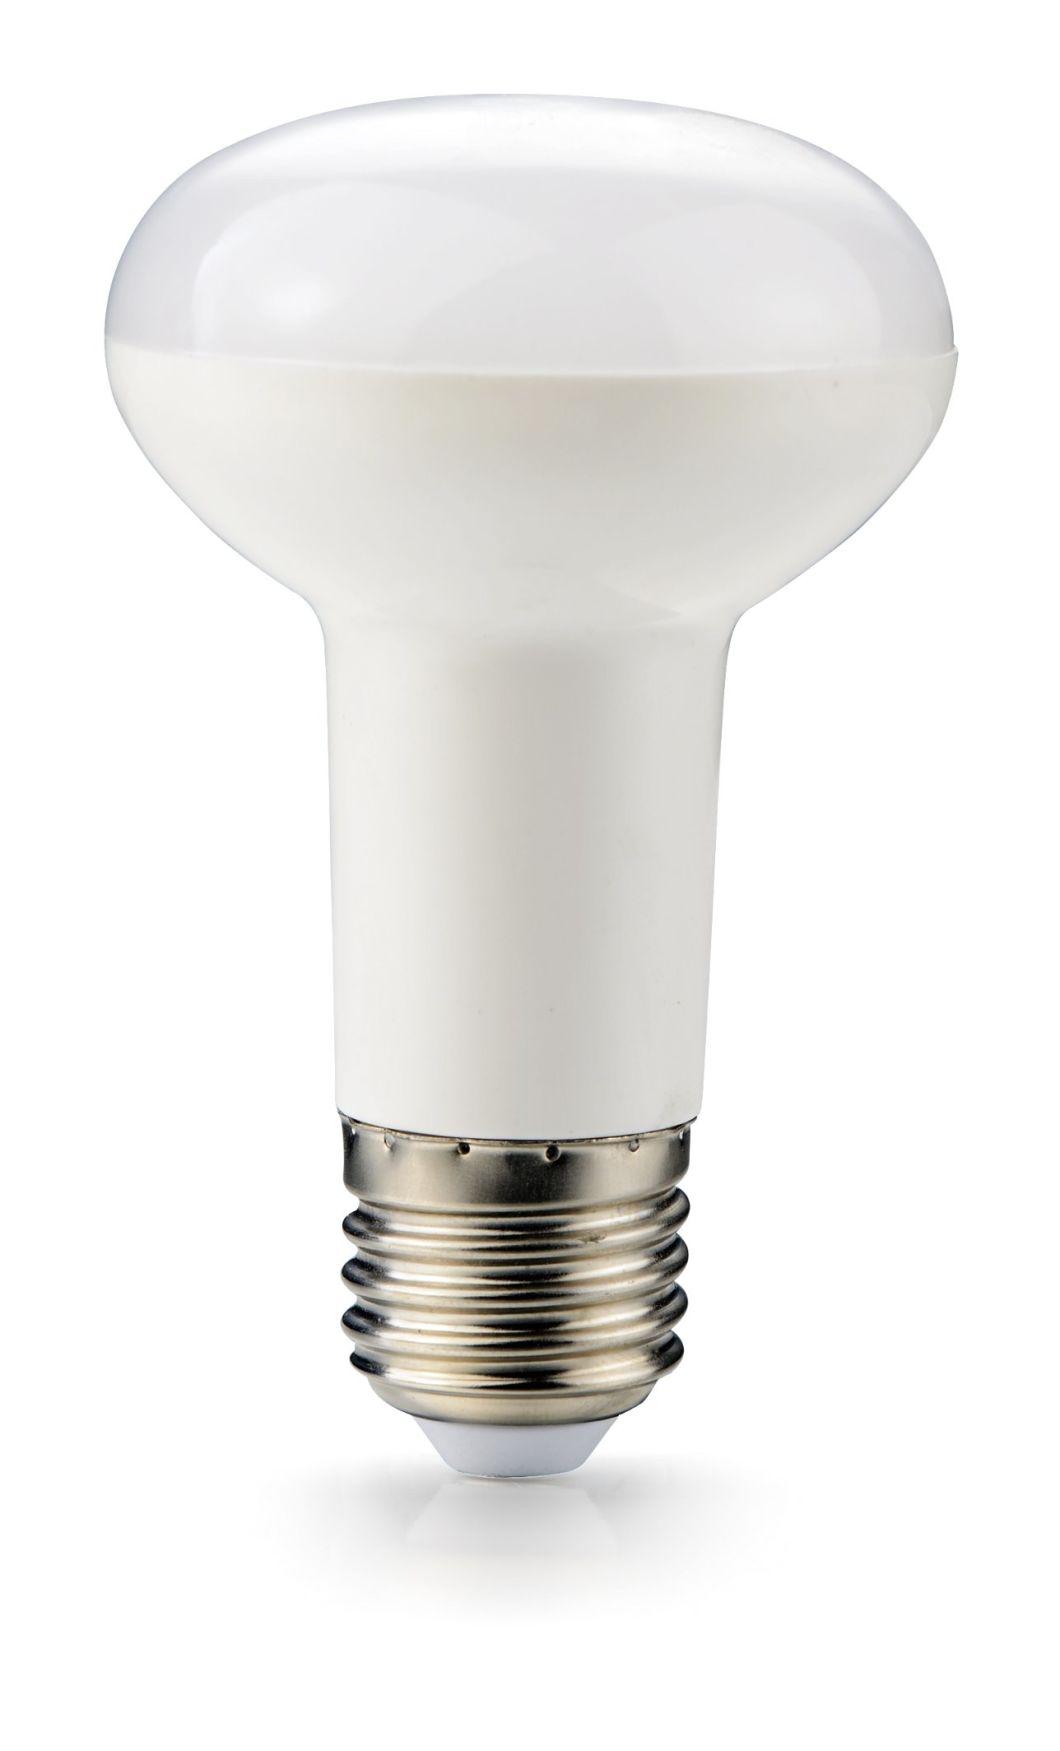 Hot Sale Plastic&Aluminum E27 Best Grow LED Bulb Light